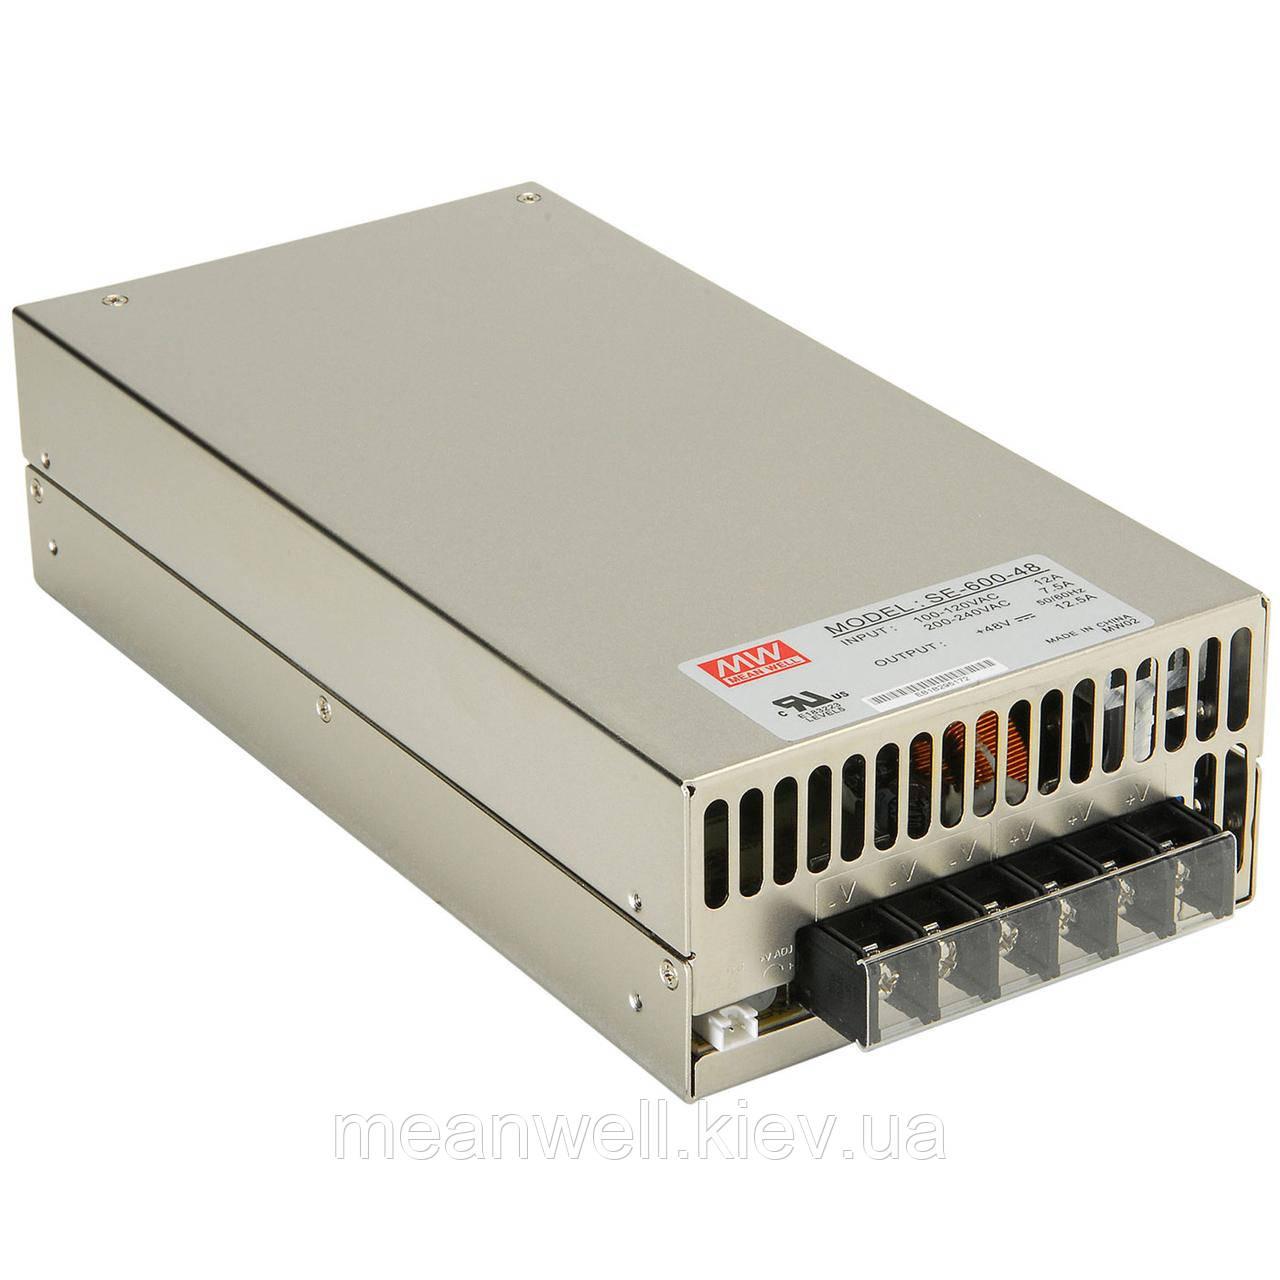 SE-600-24 Блок питания Mean Well  600 вт, 24 в, 25 А